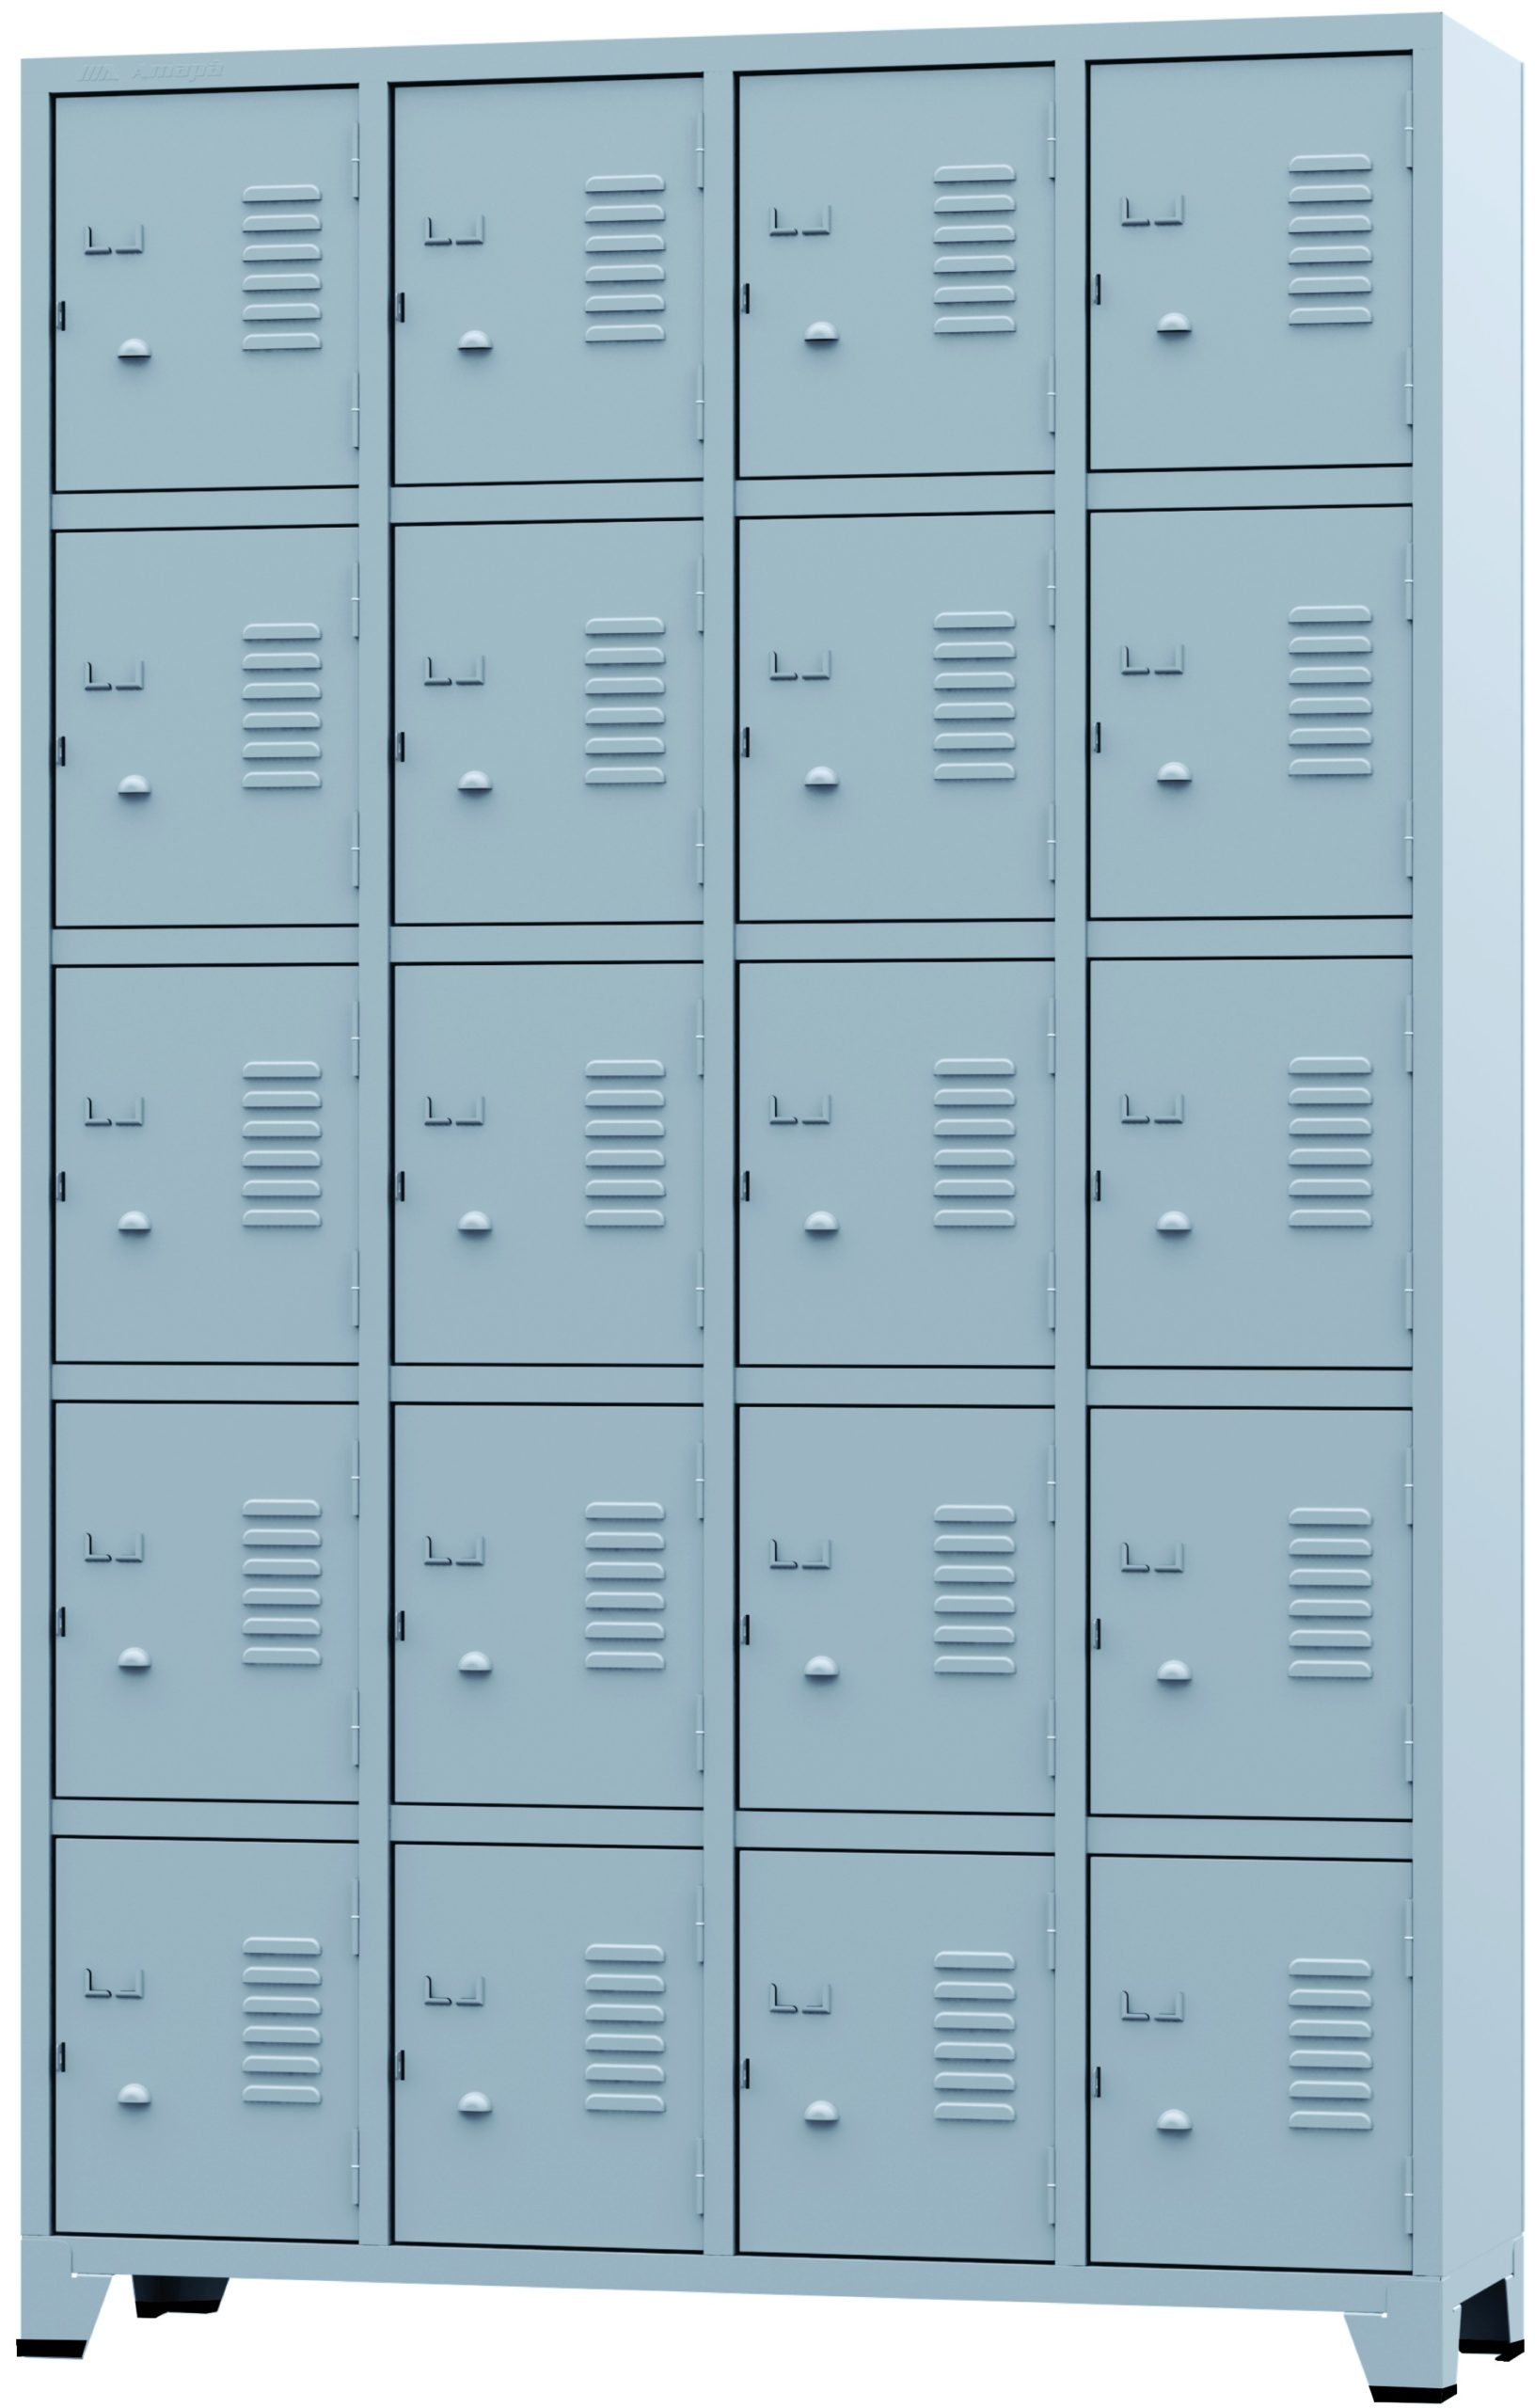 armario-industrial/armario-vestiario/armario-roupeiro-com-20-portas-p